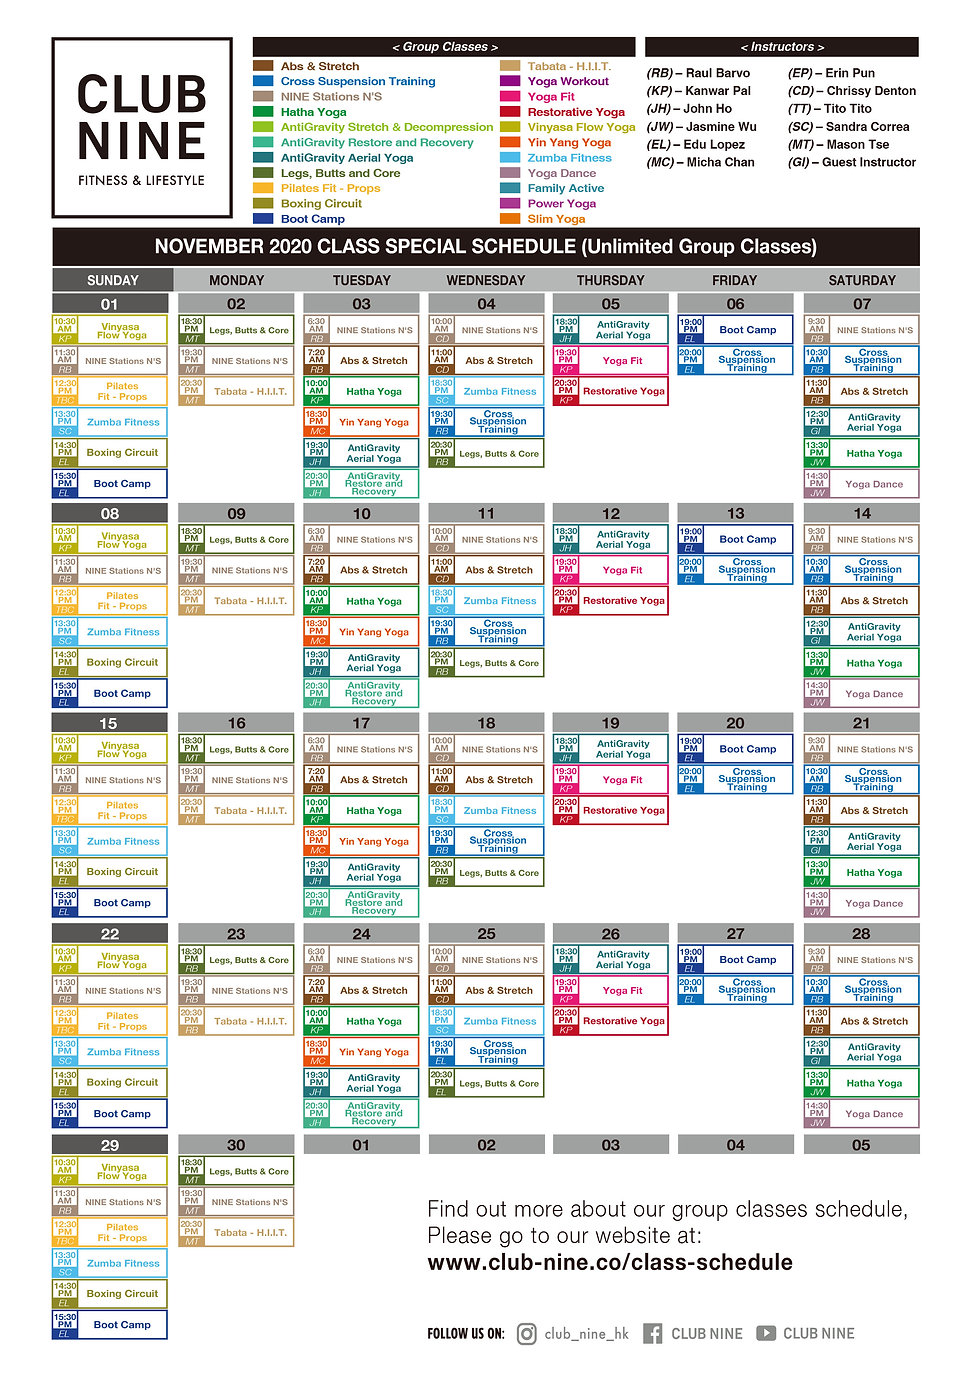 CN_Schedule_November_2020.jpg